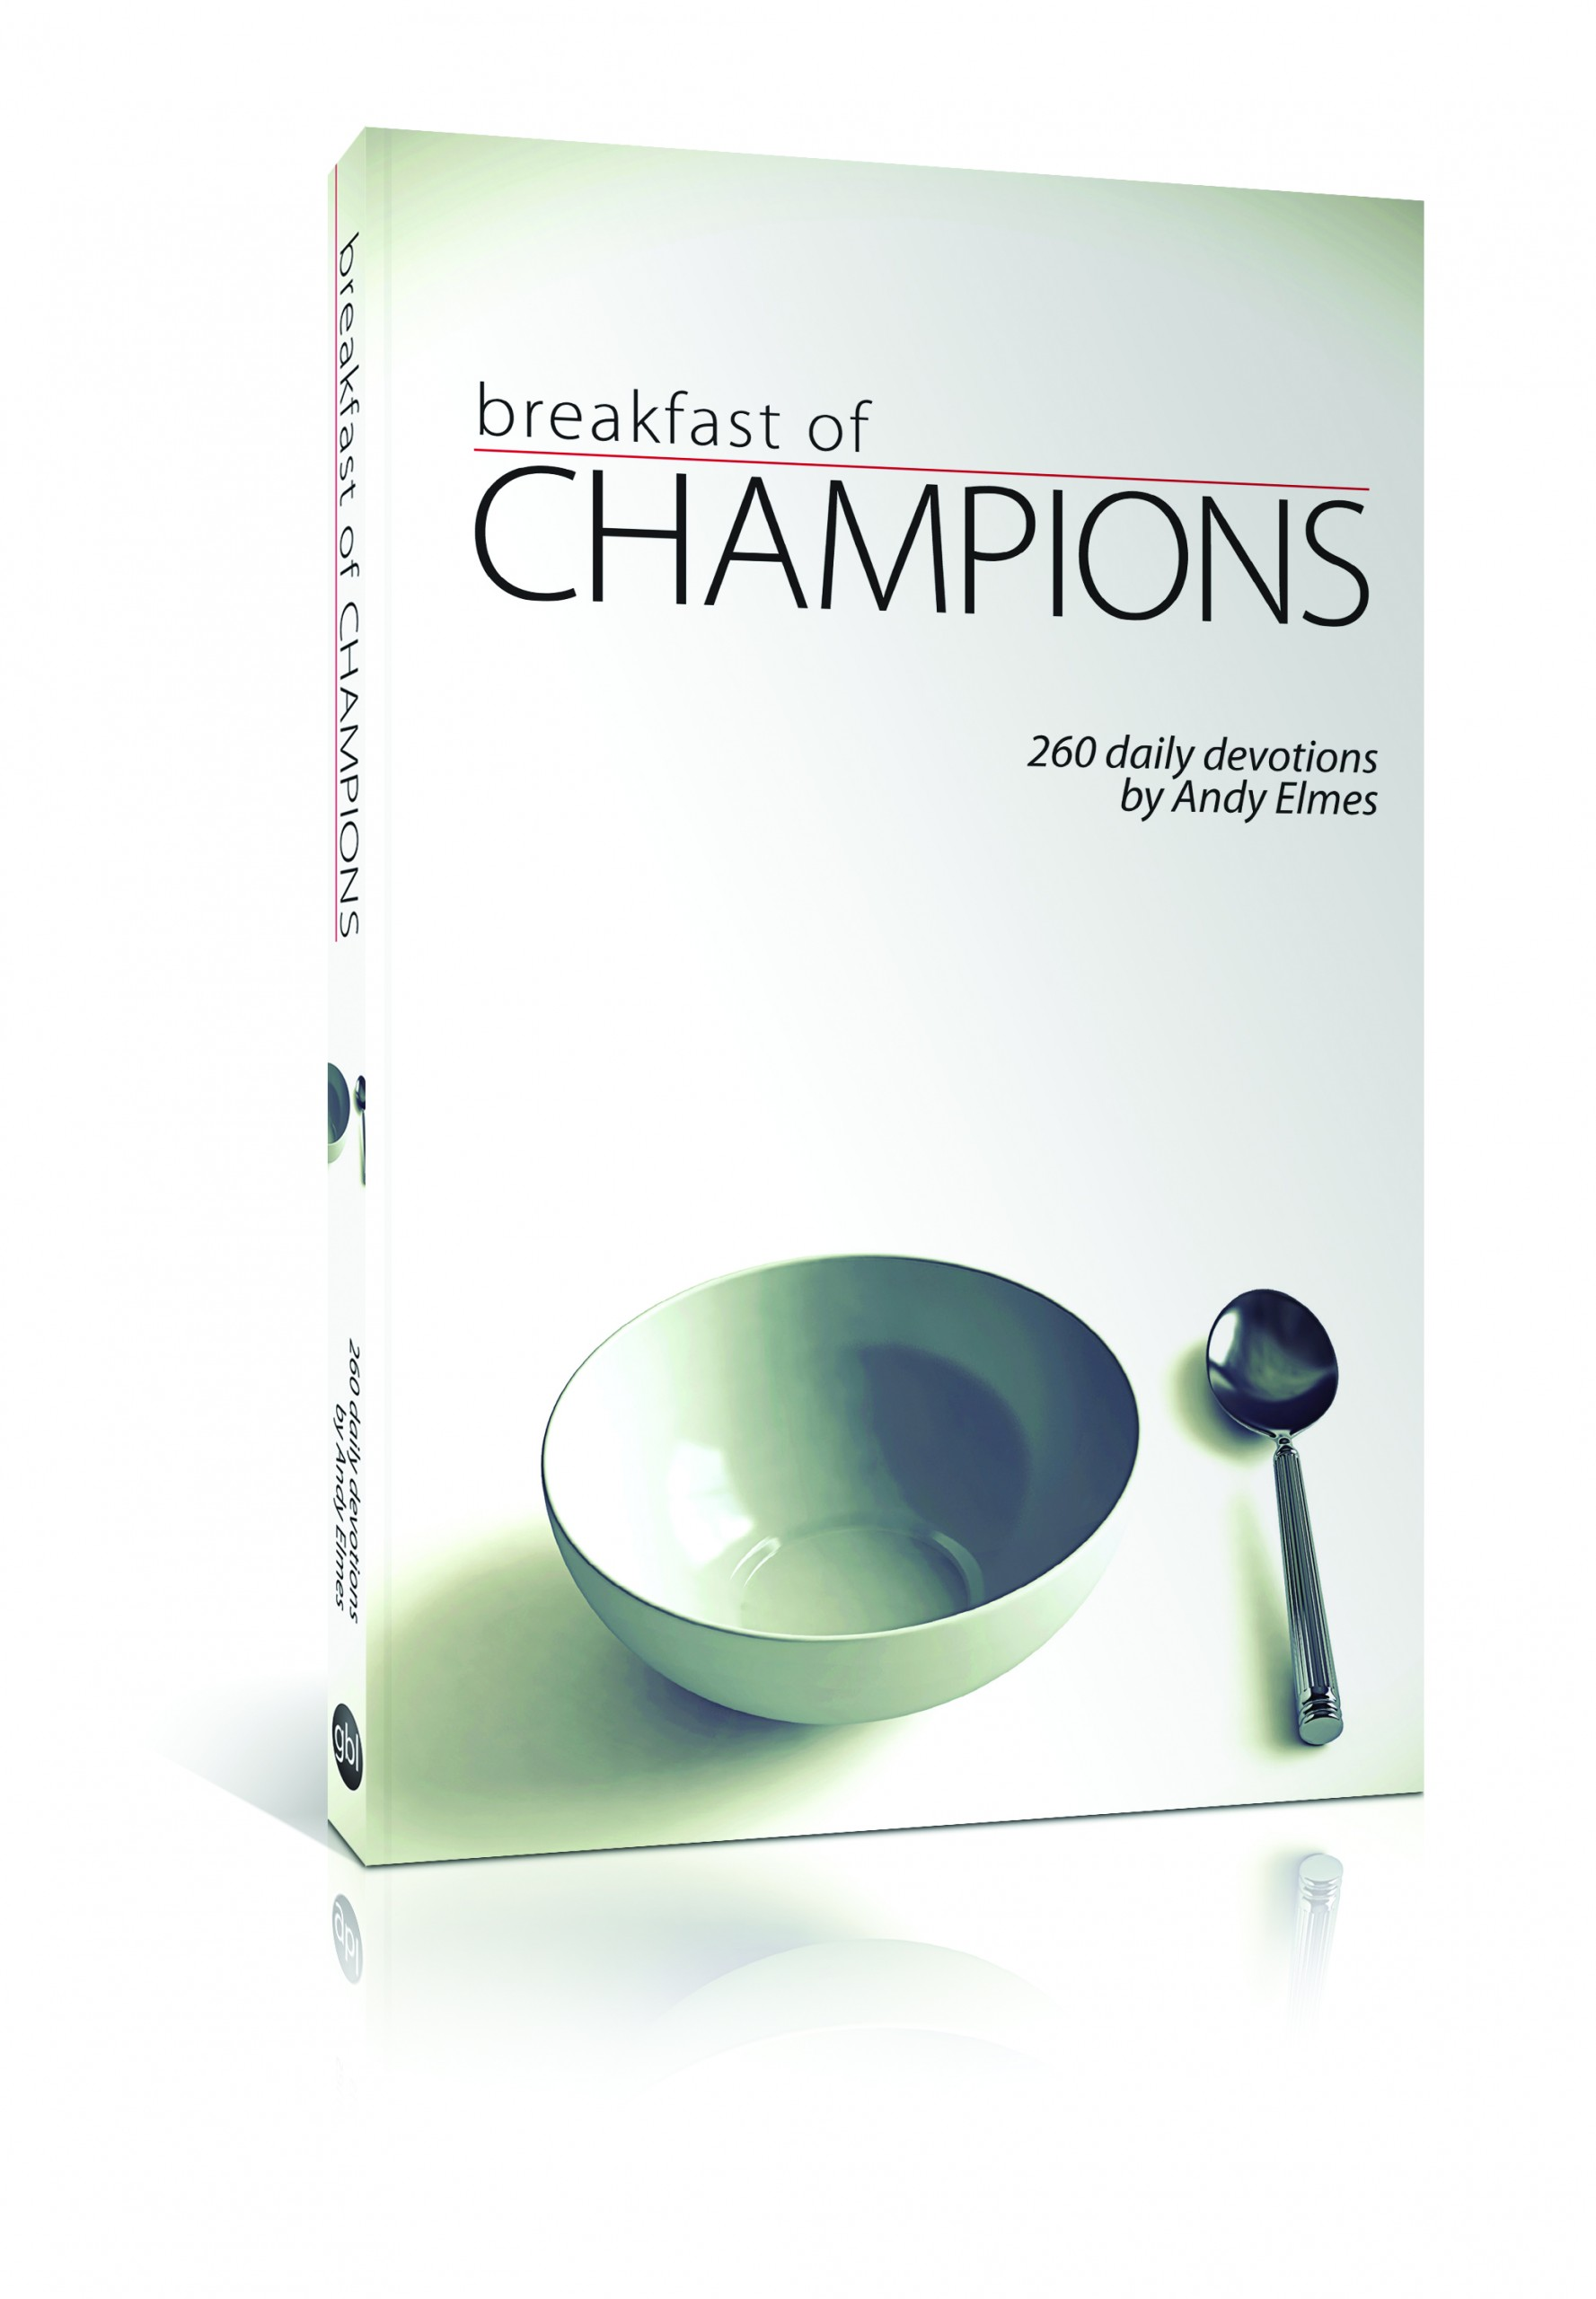 Breakfast of Champions Volume 1